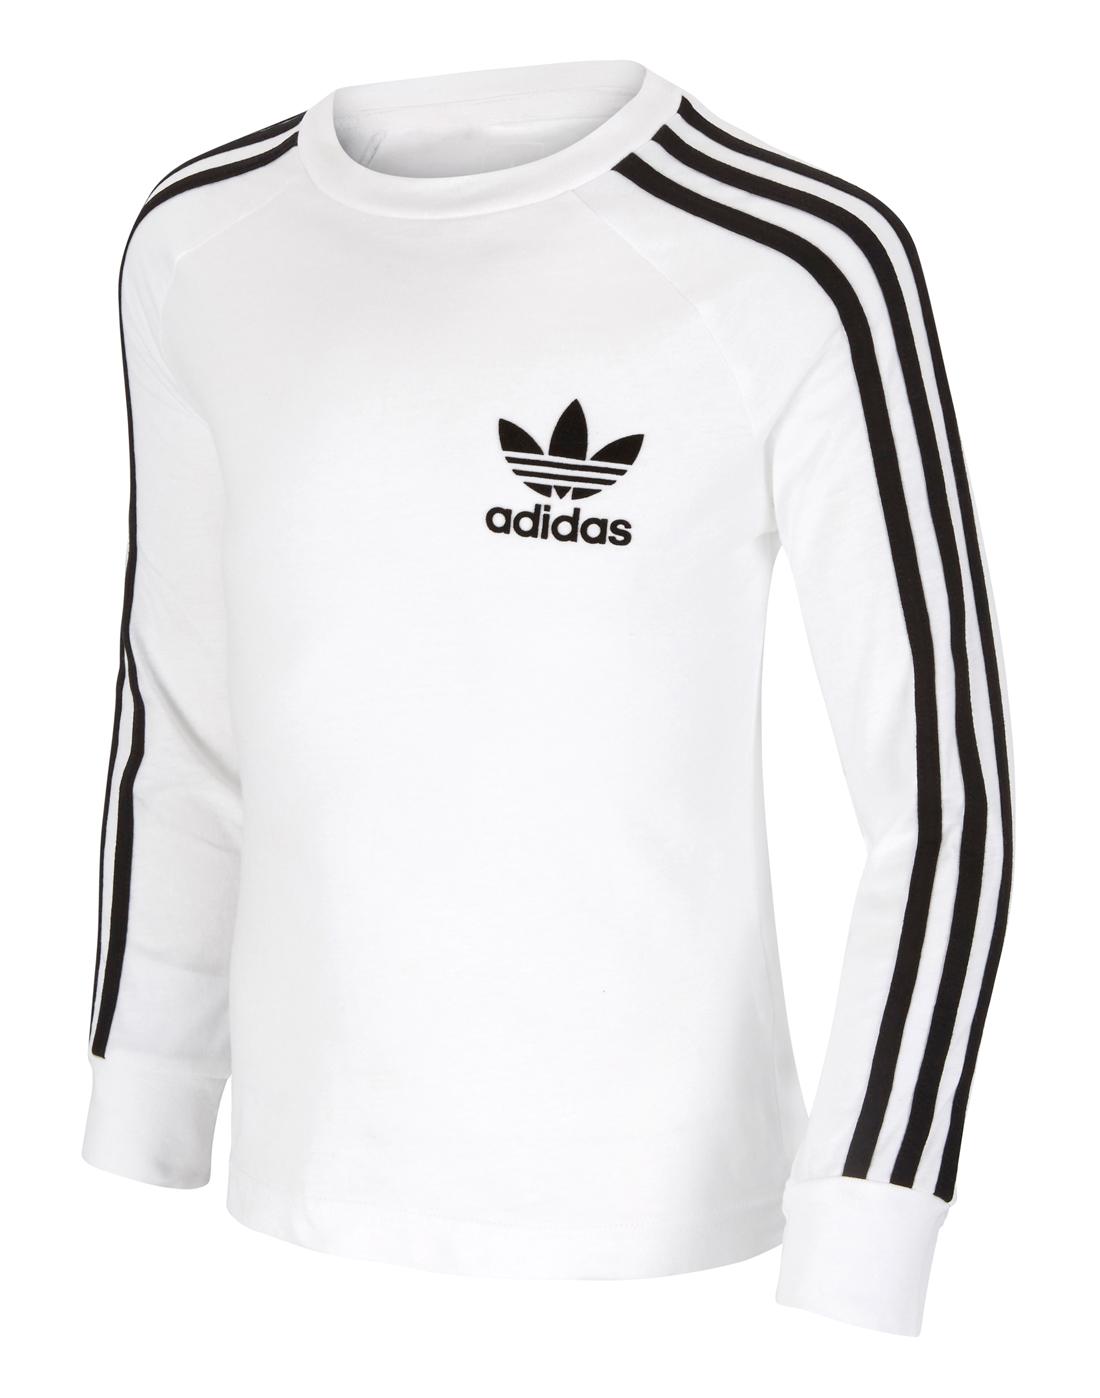 c1e931d2 adidas Originals Older Girls Originals Calfn T-Shirt | Life Style Sports